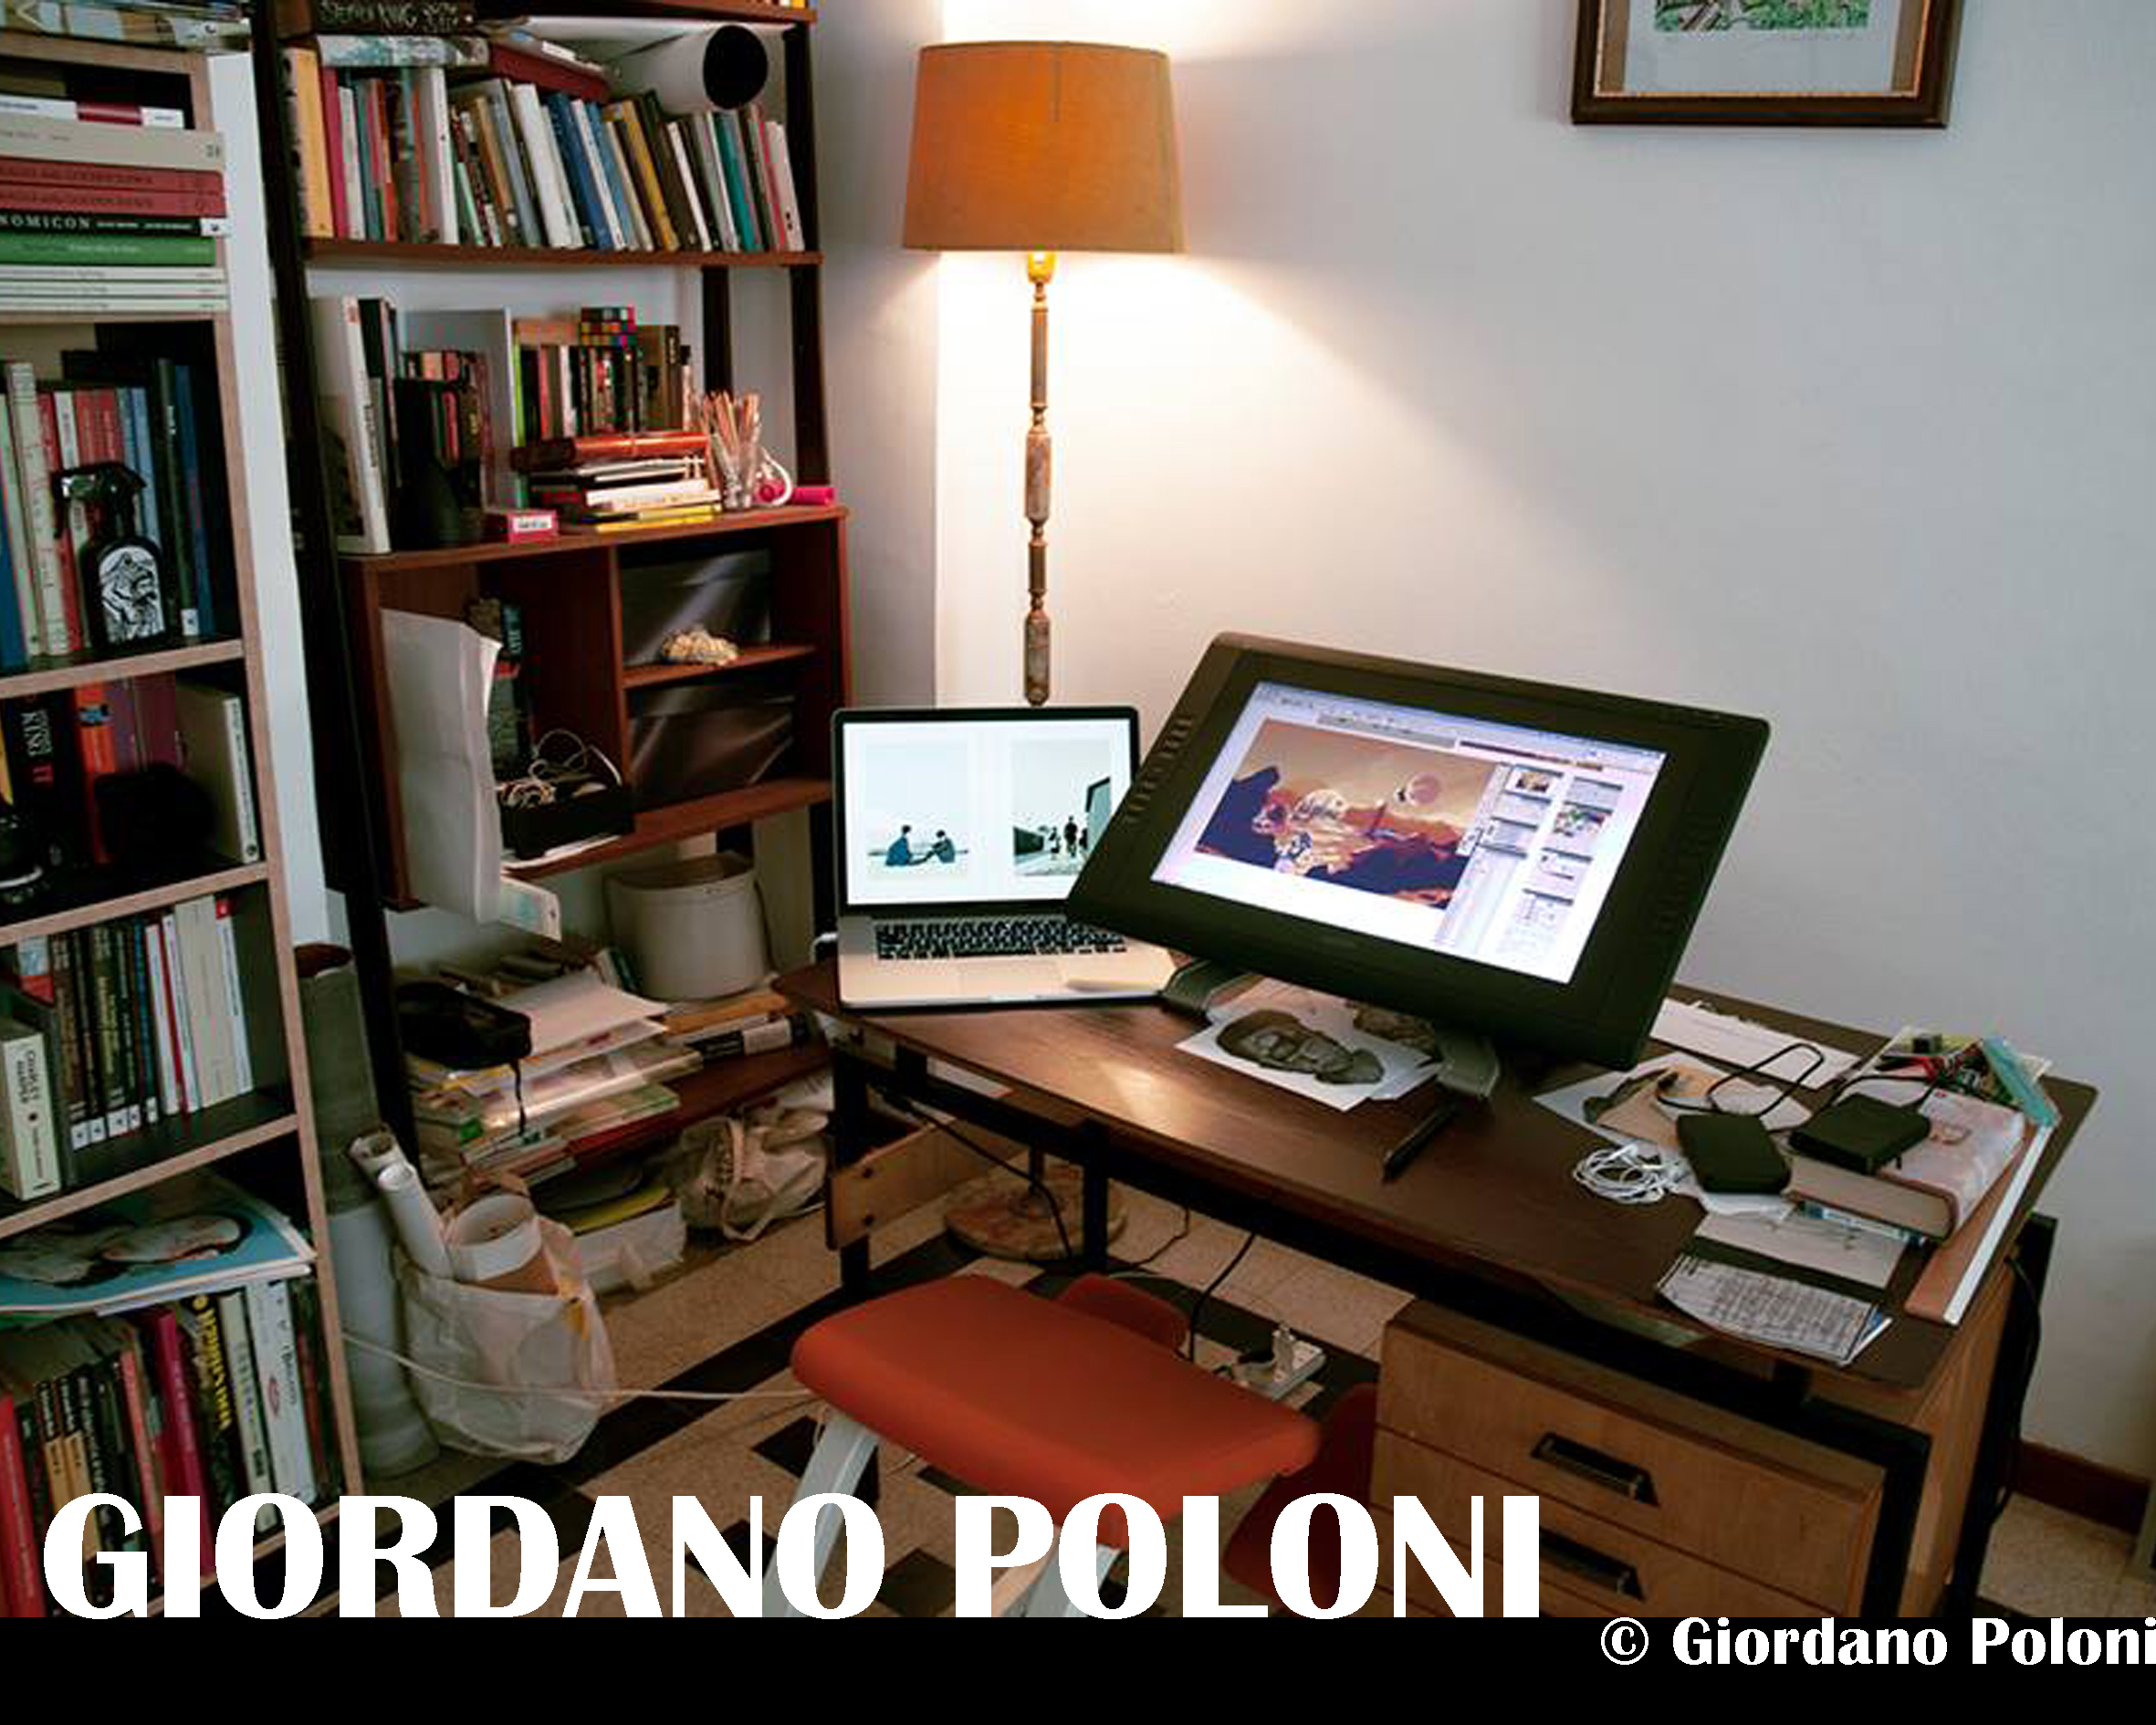 Giordano Poloni